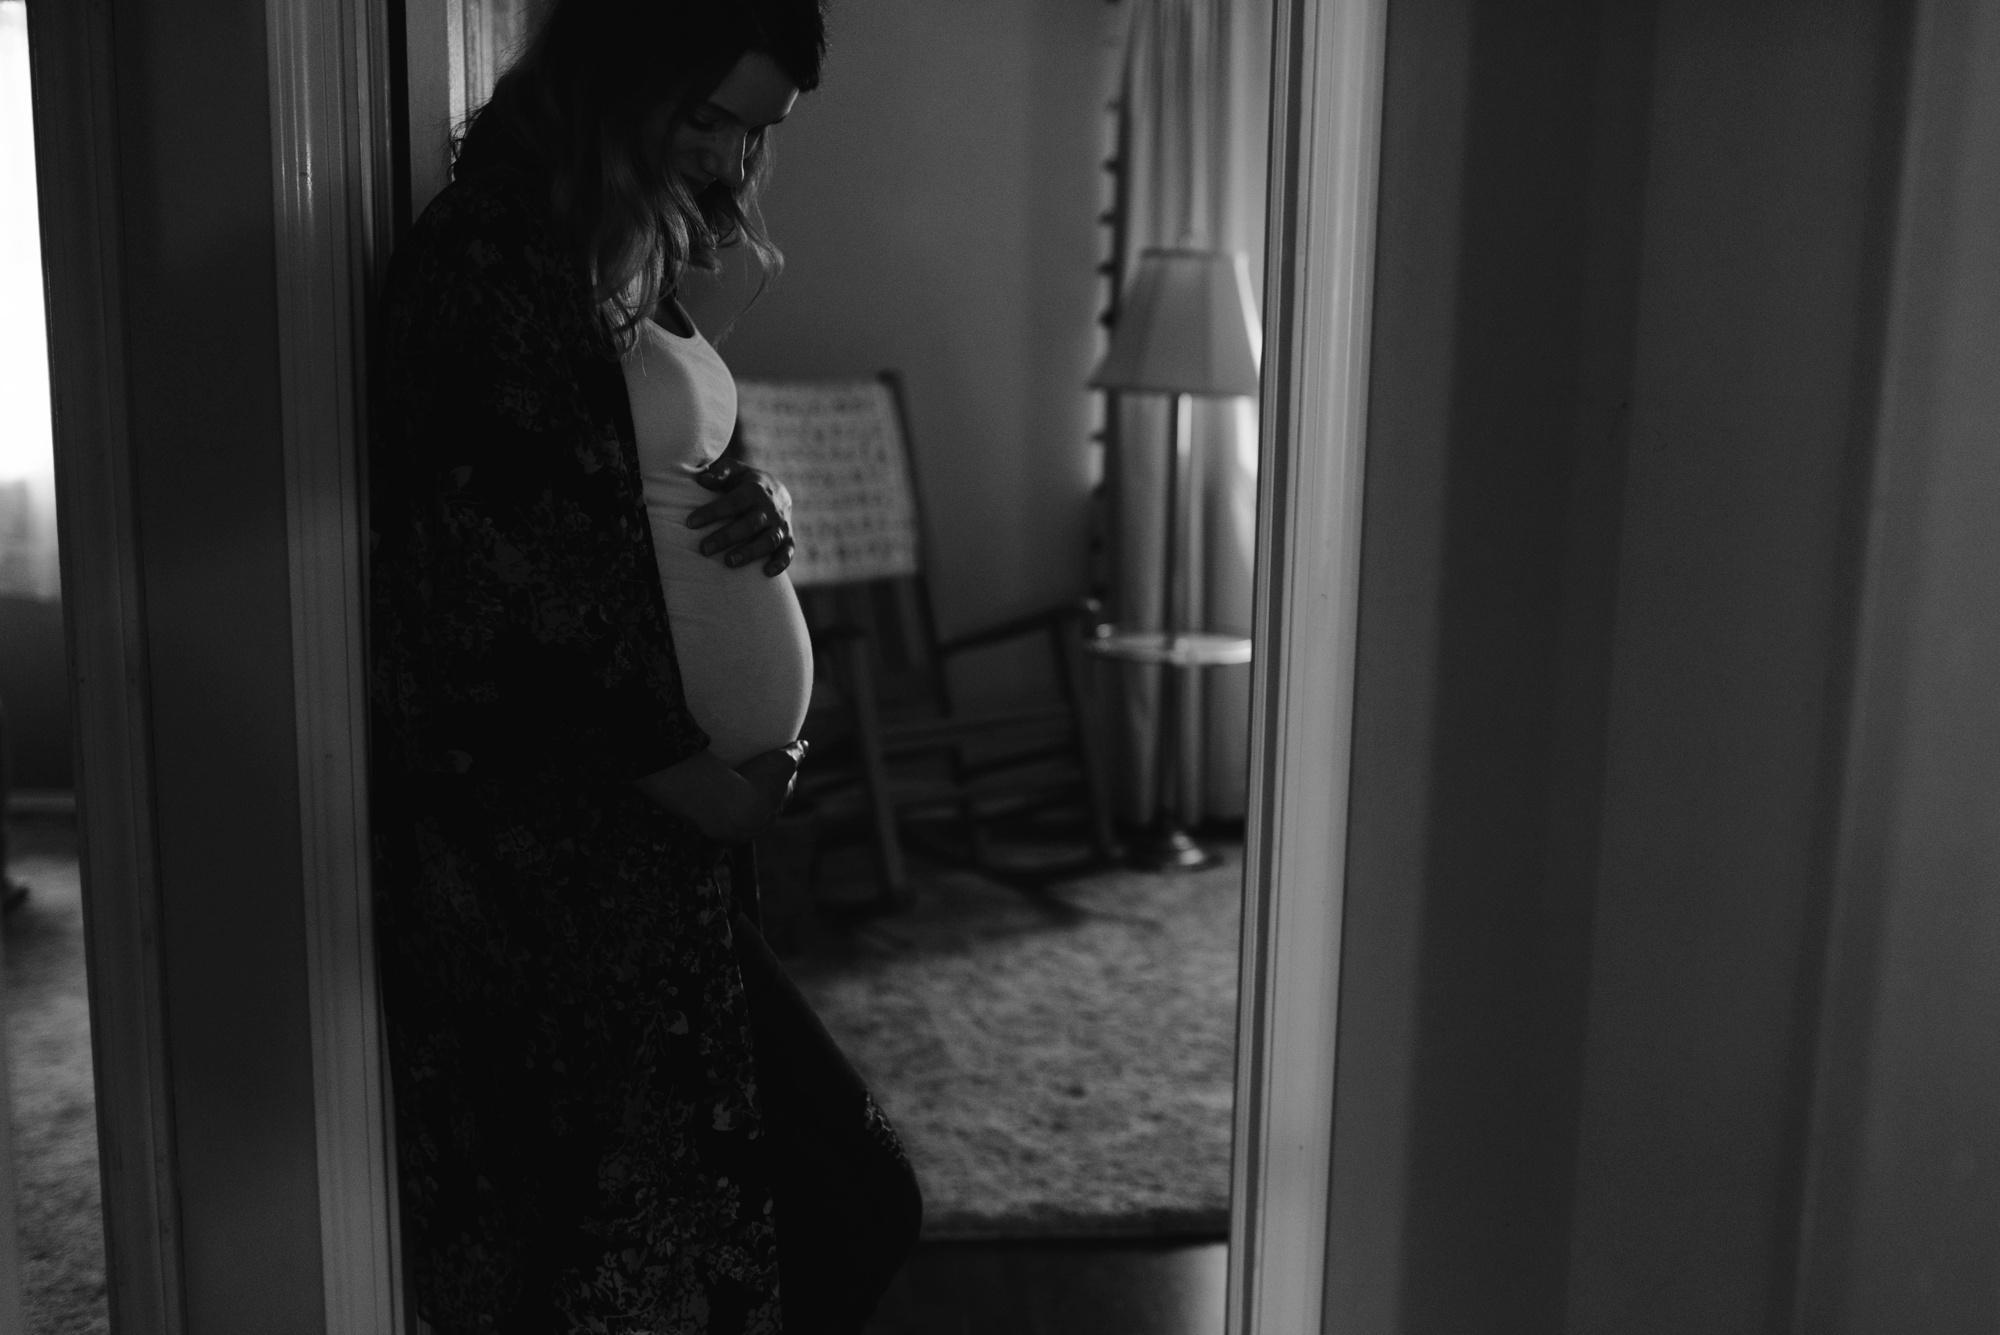 maternity-danielle-b-lauren-grayson-cleveland-akron-canton-ohio-photographer-family-maternity-photography-session-photos-_0025.jpg